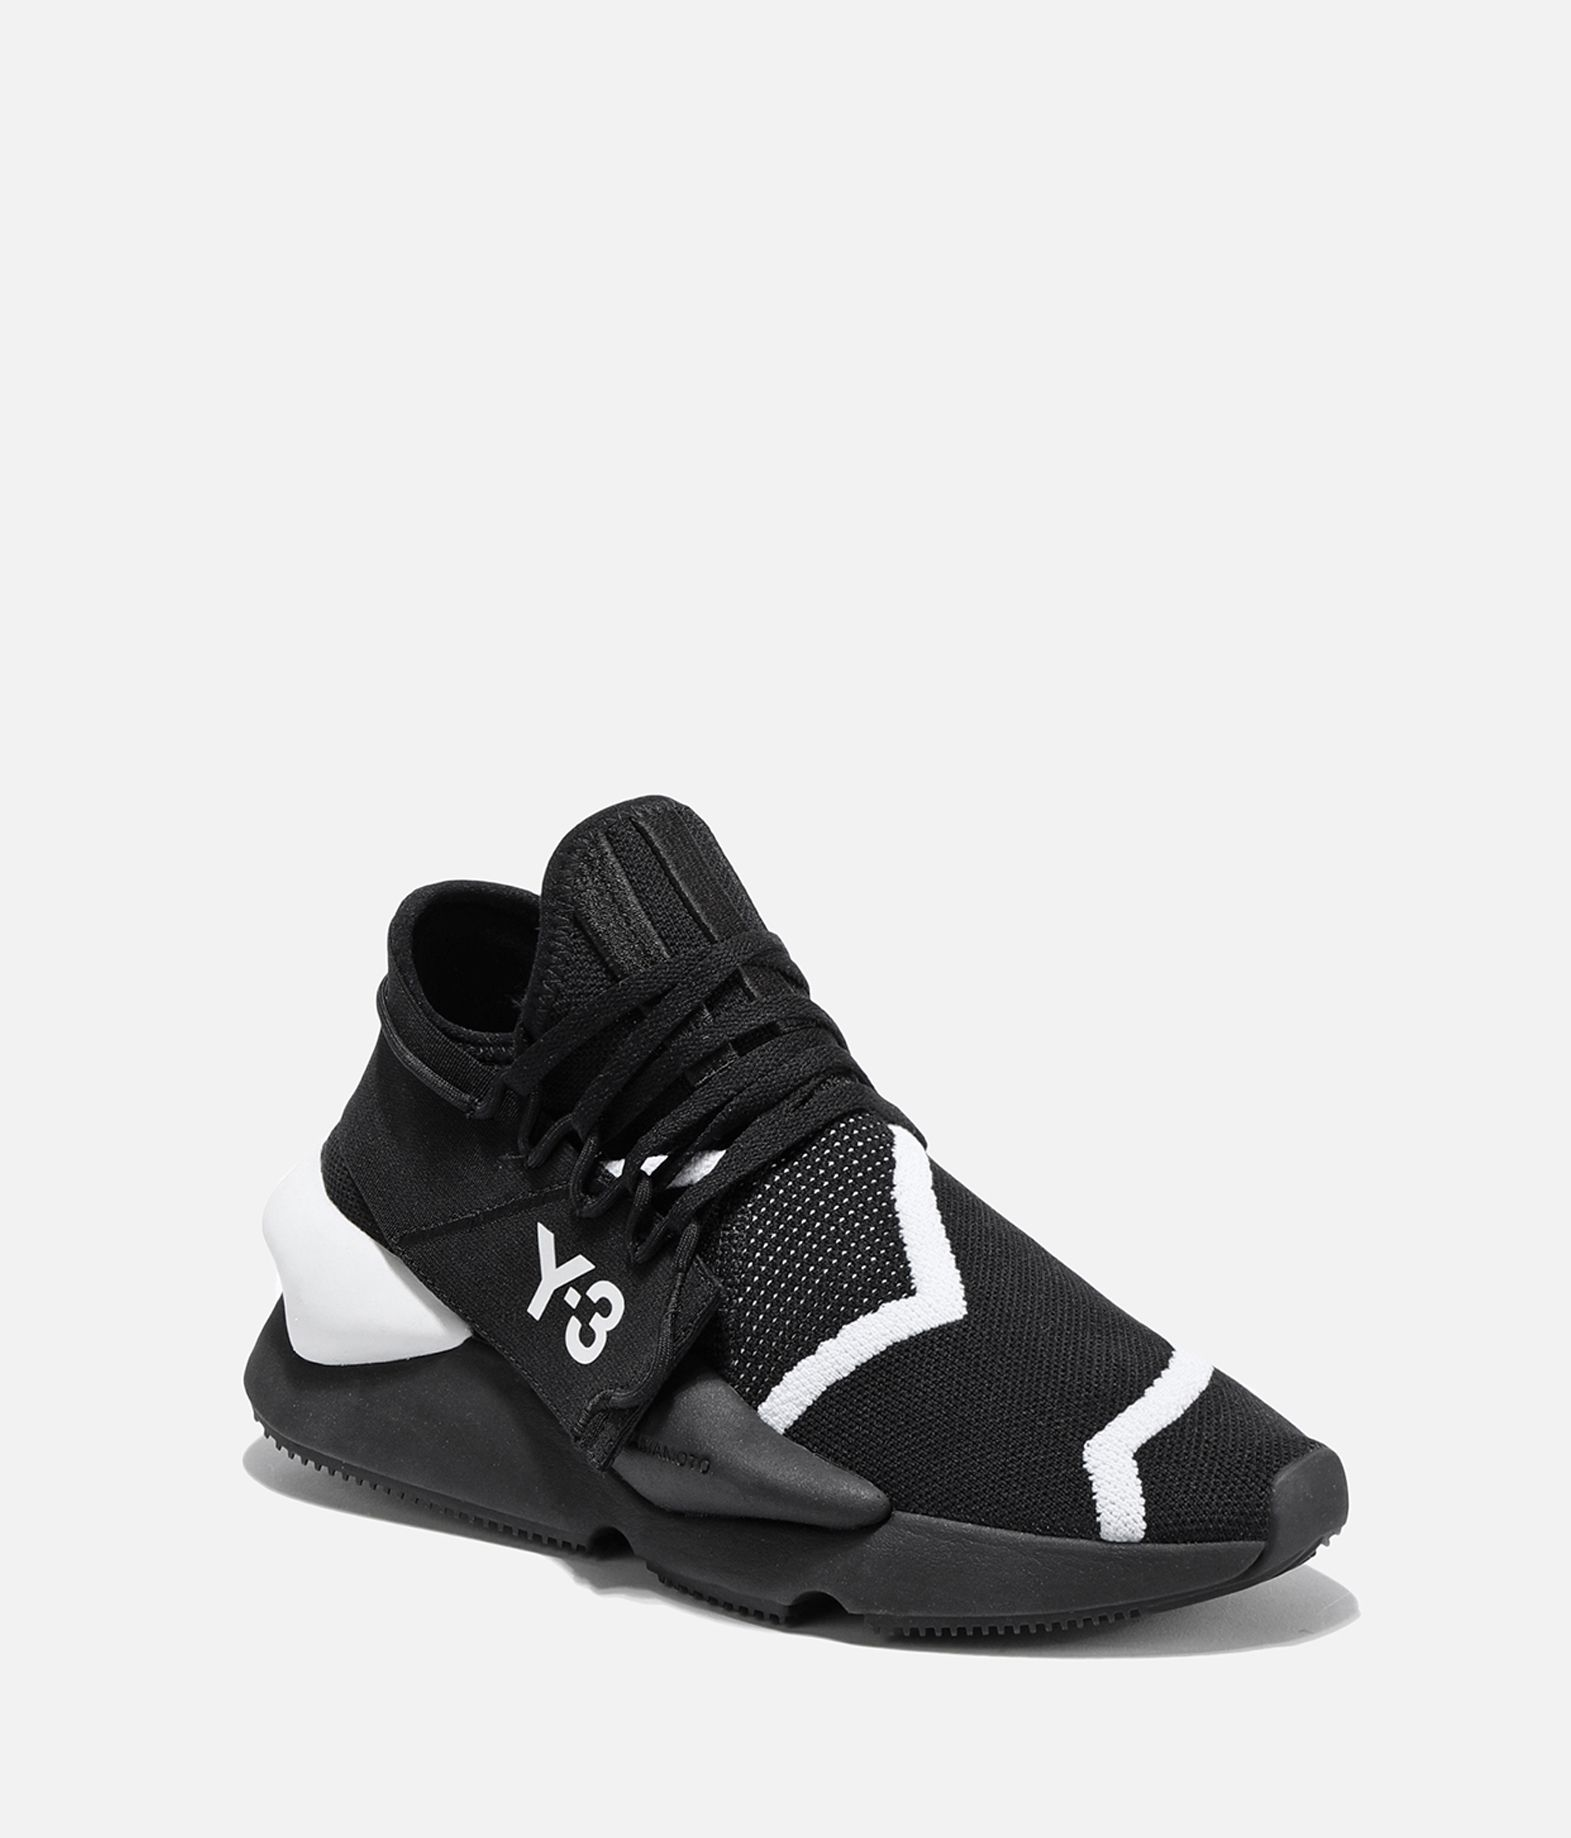 Y-3 Y-3 Kaiwa Knit Sneakers E e